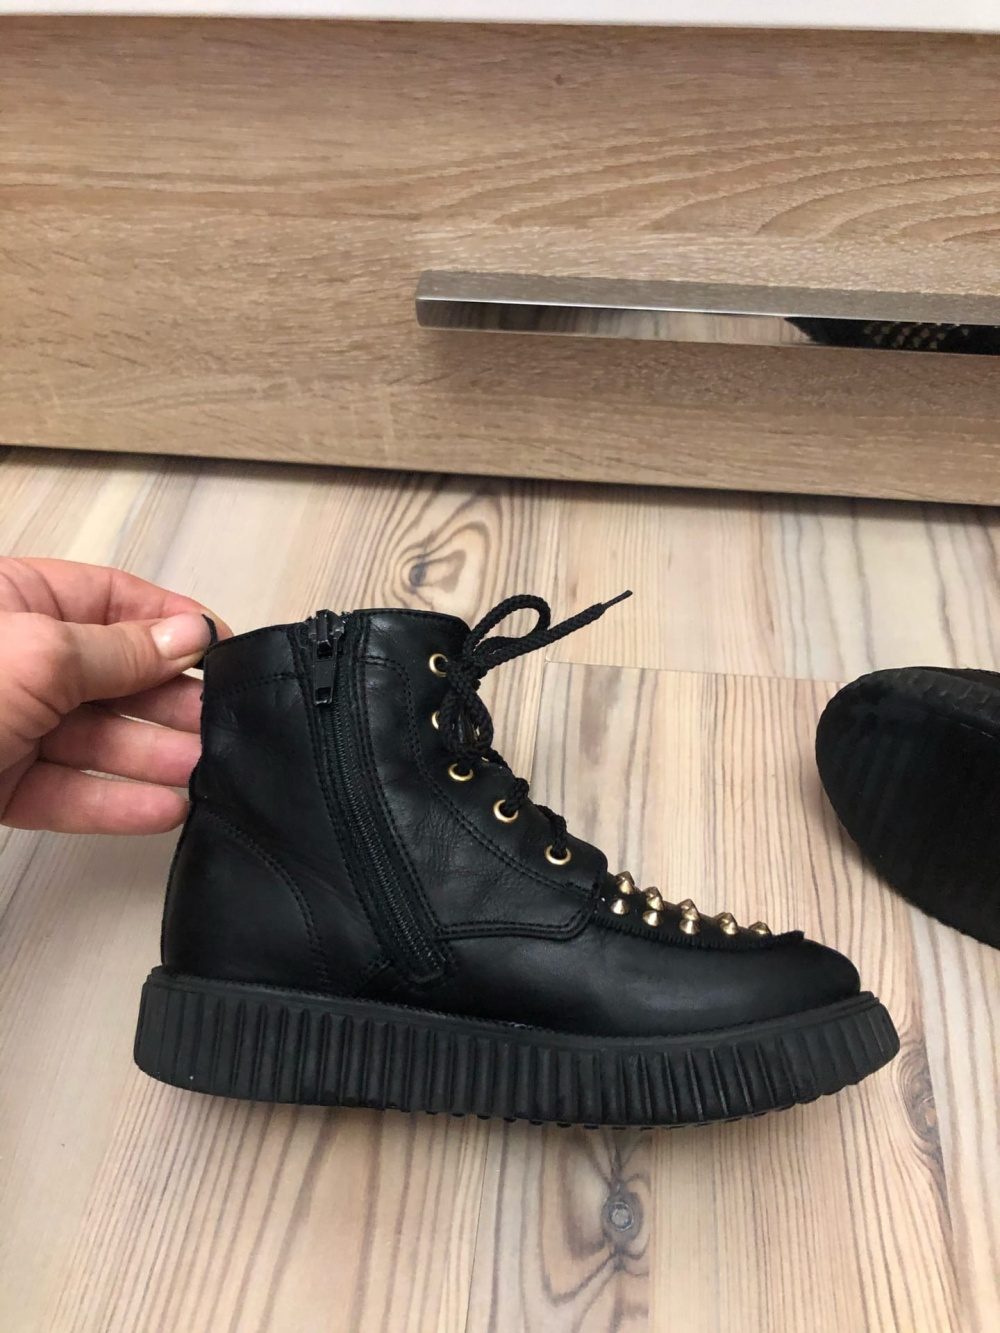 Ботинки Florens. Размер 28.